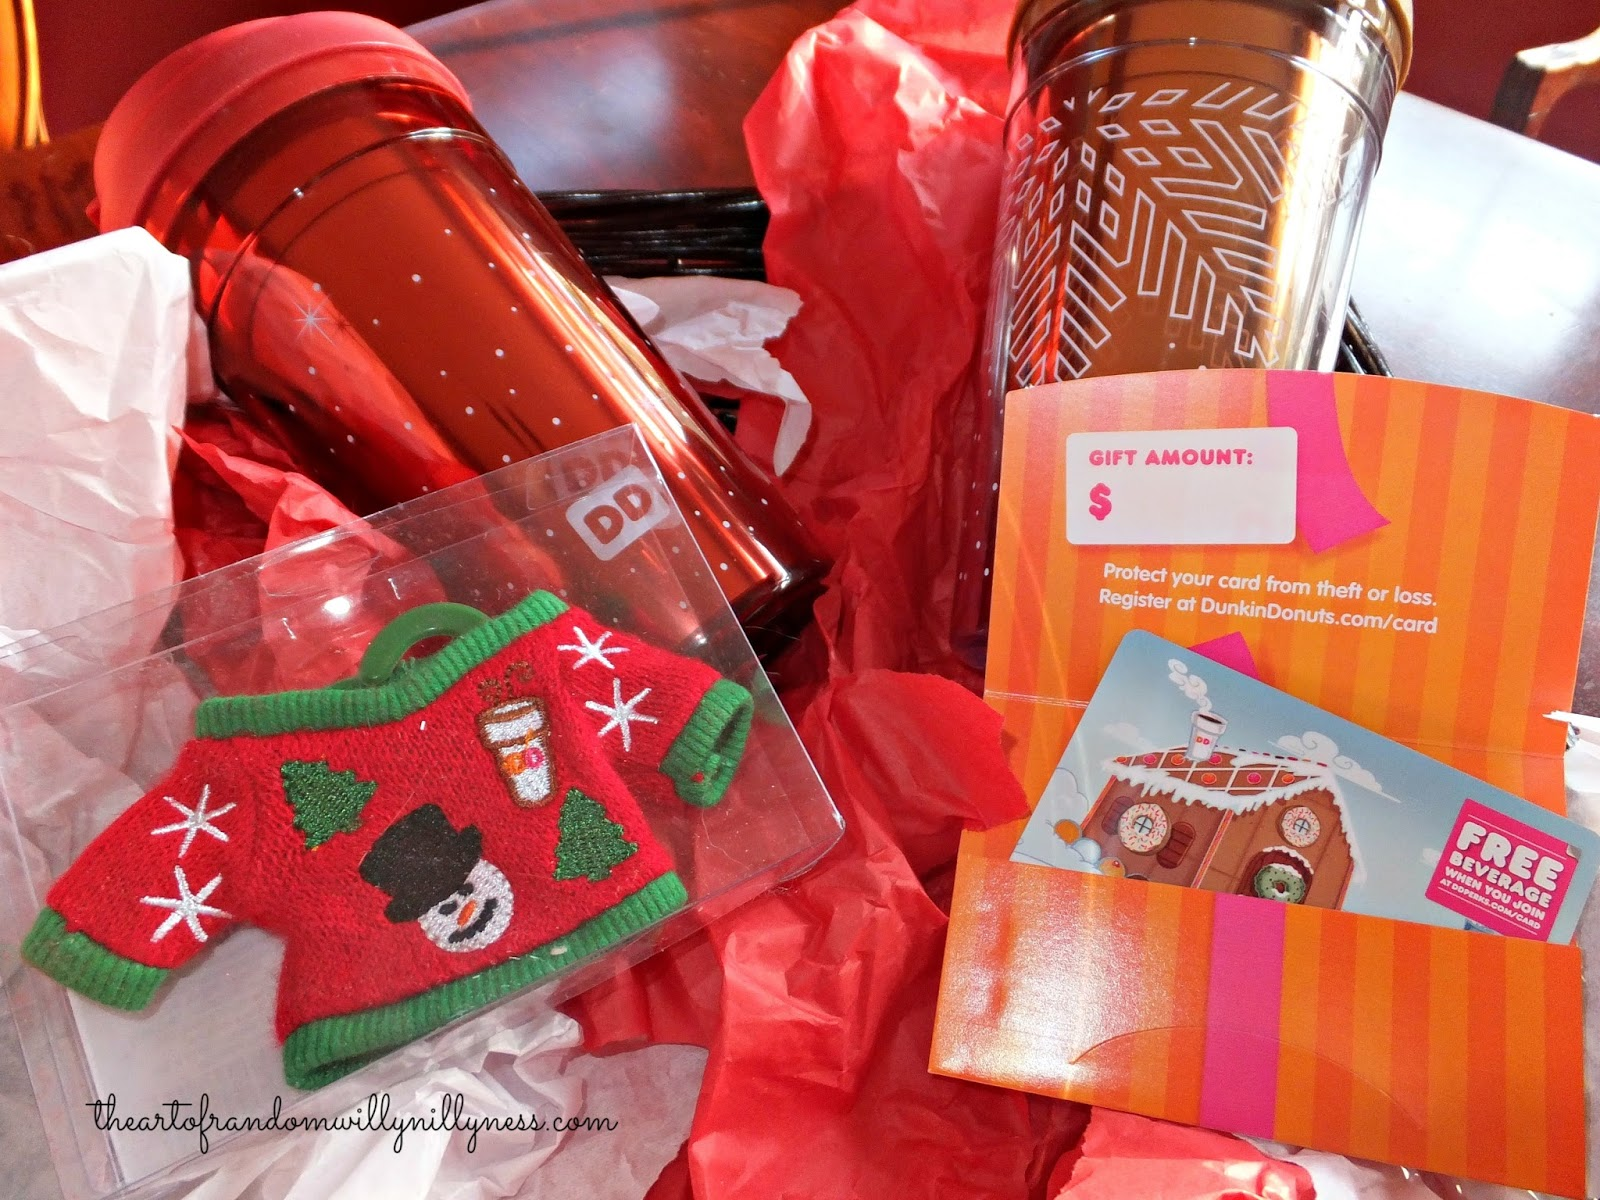 Dunkin Donuts Holiday Travel Mugs